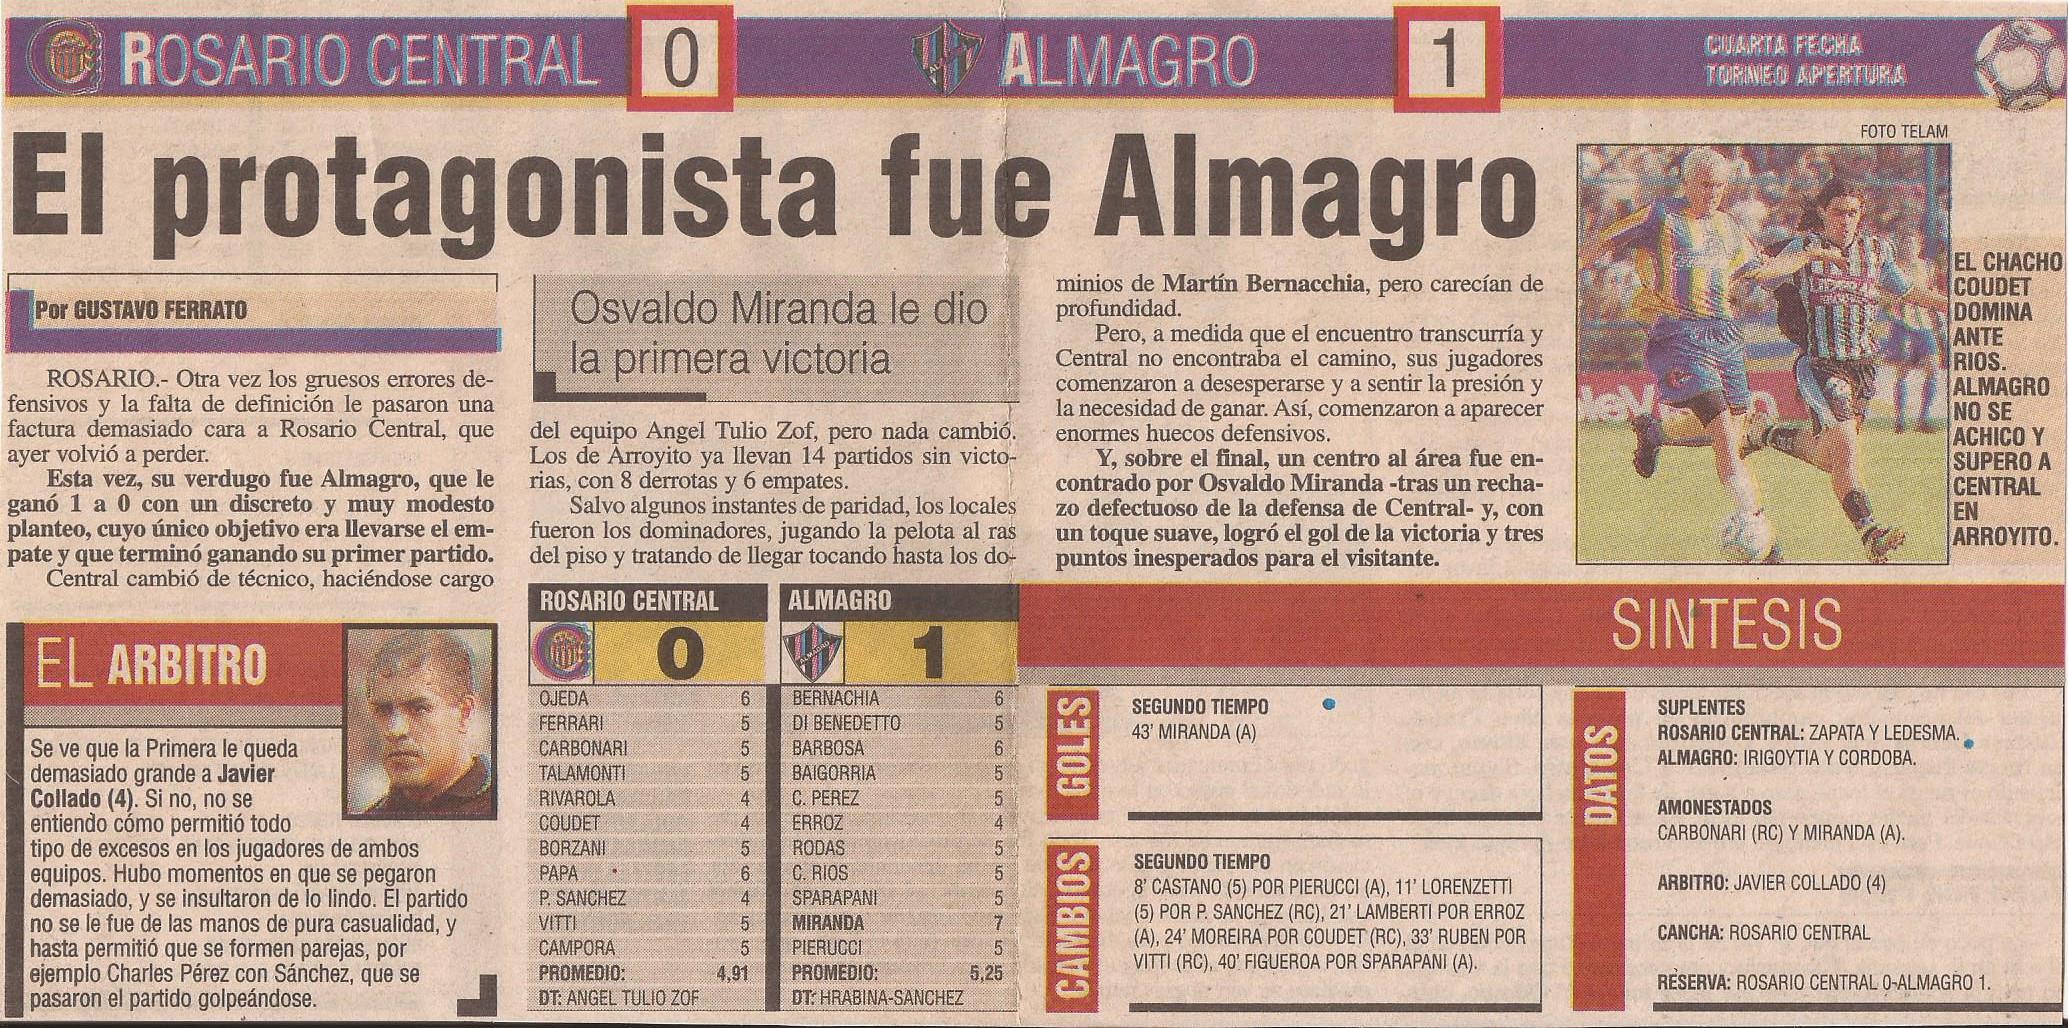 2004-05 Primera Division - Rosario Central vs Almagro - Diario Popular